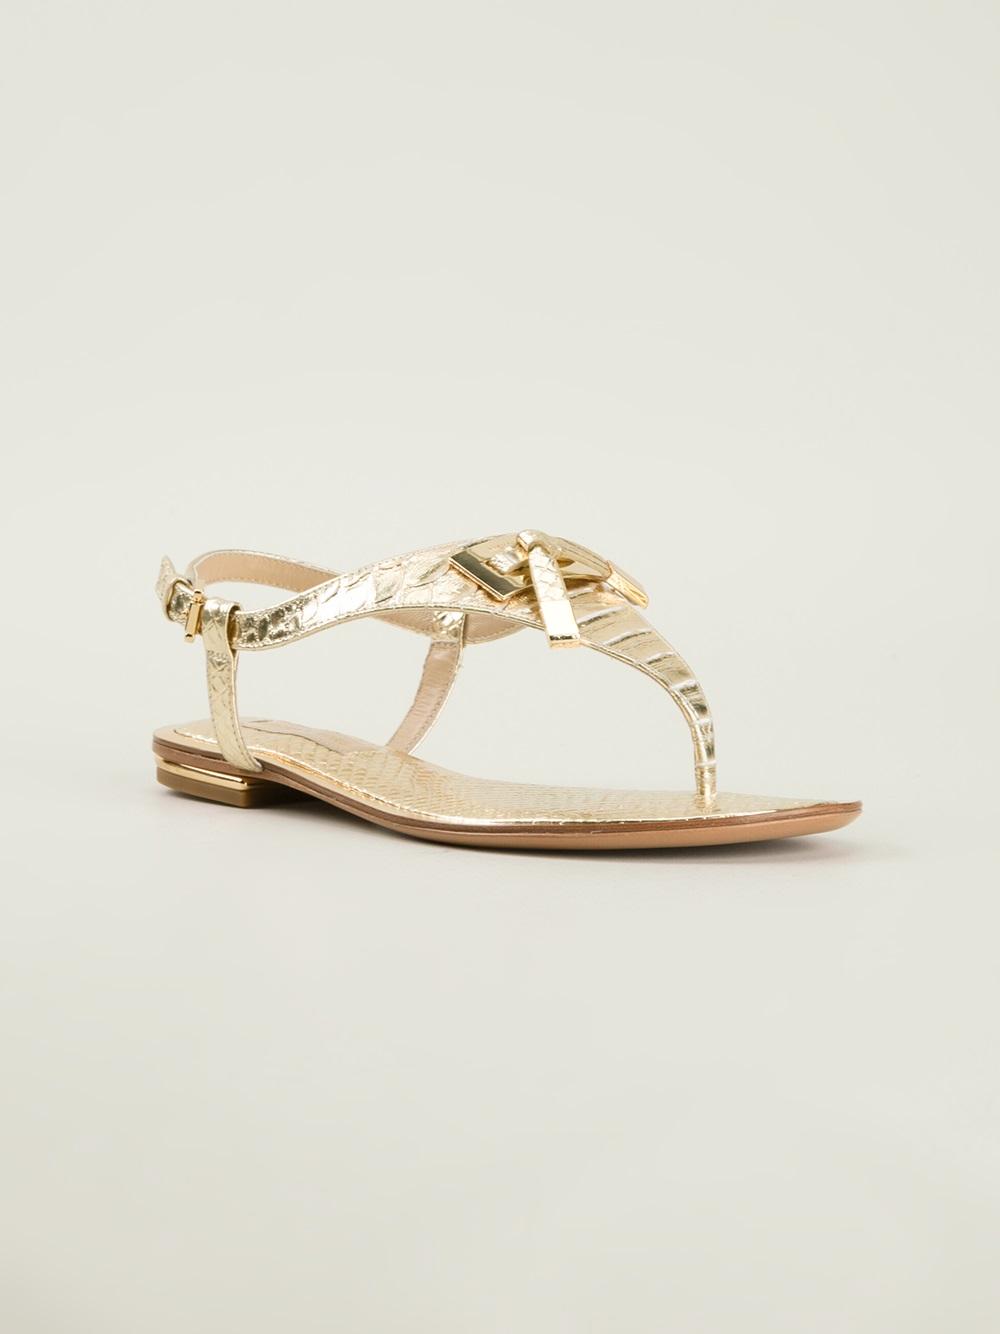 Lyst Michael Kors Thong Sandals In Metallic